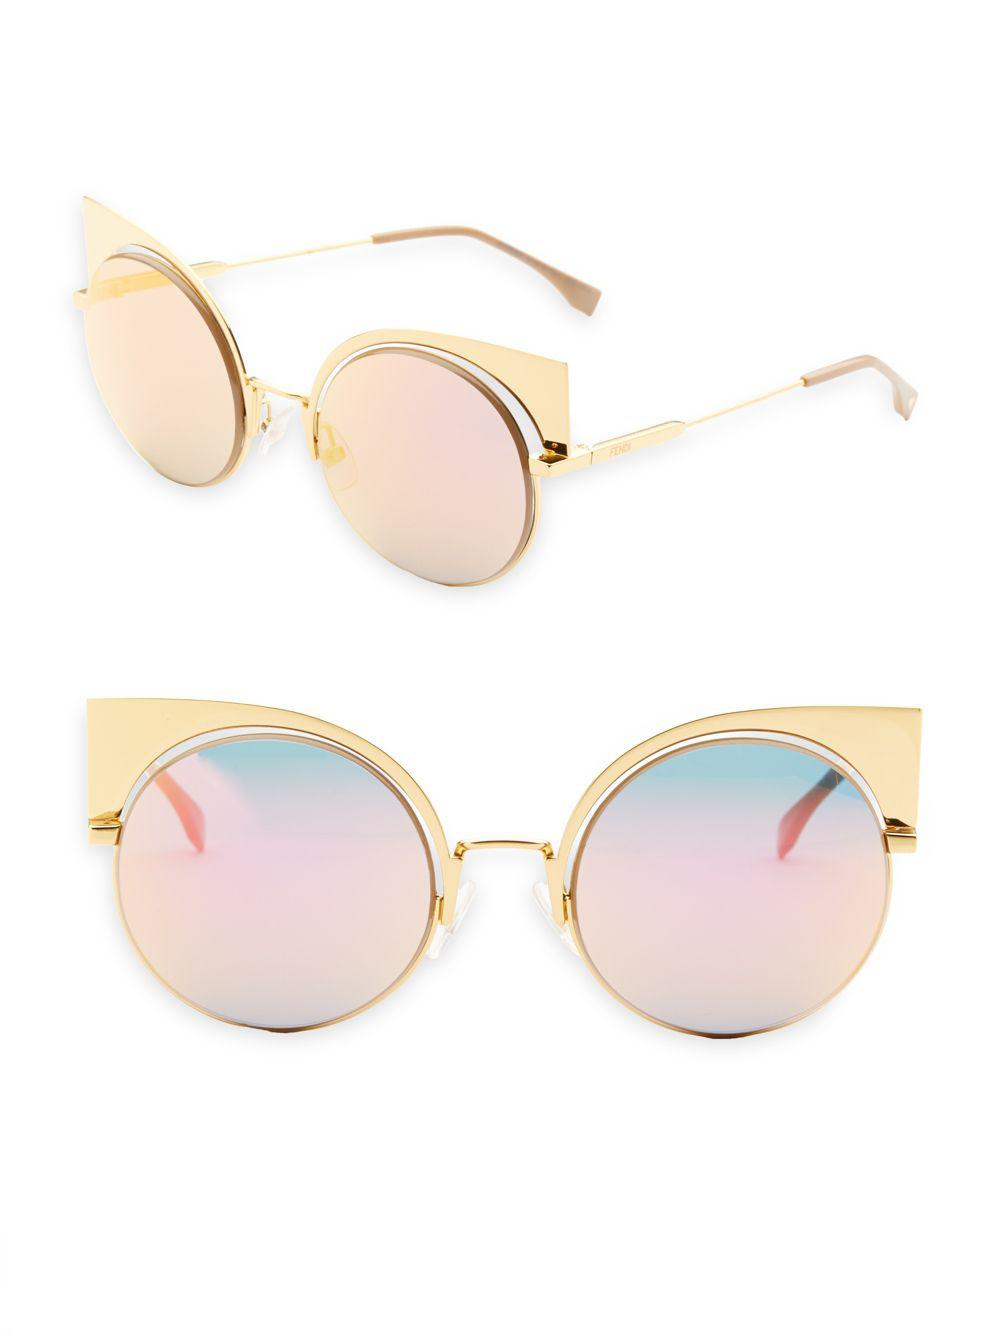 dae13ed9111e9 Lyst - Fendi 53mm Mirrored Cat s-eye Sunglasses in Pink